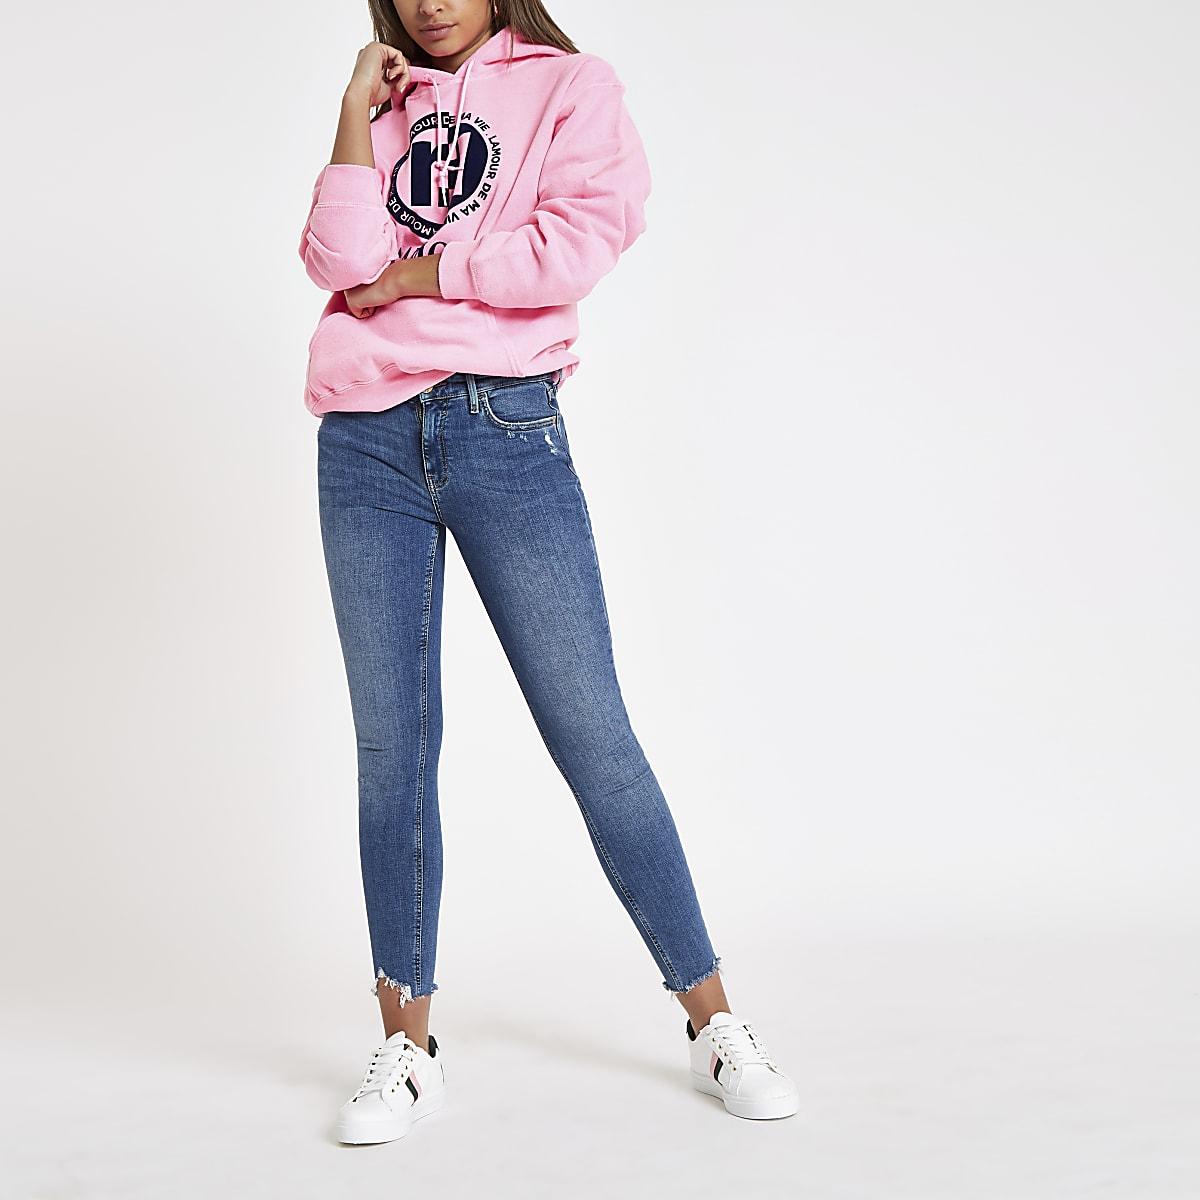 Pink fluroscent 'L'amour' print hoodie